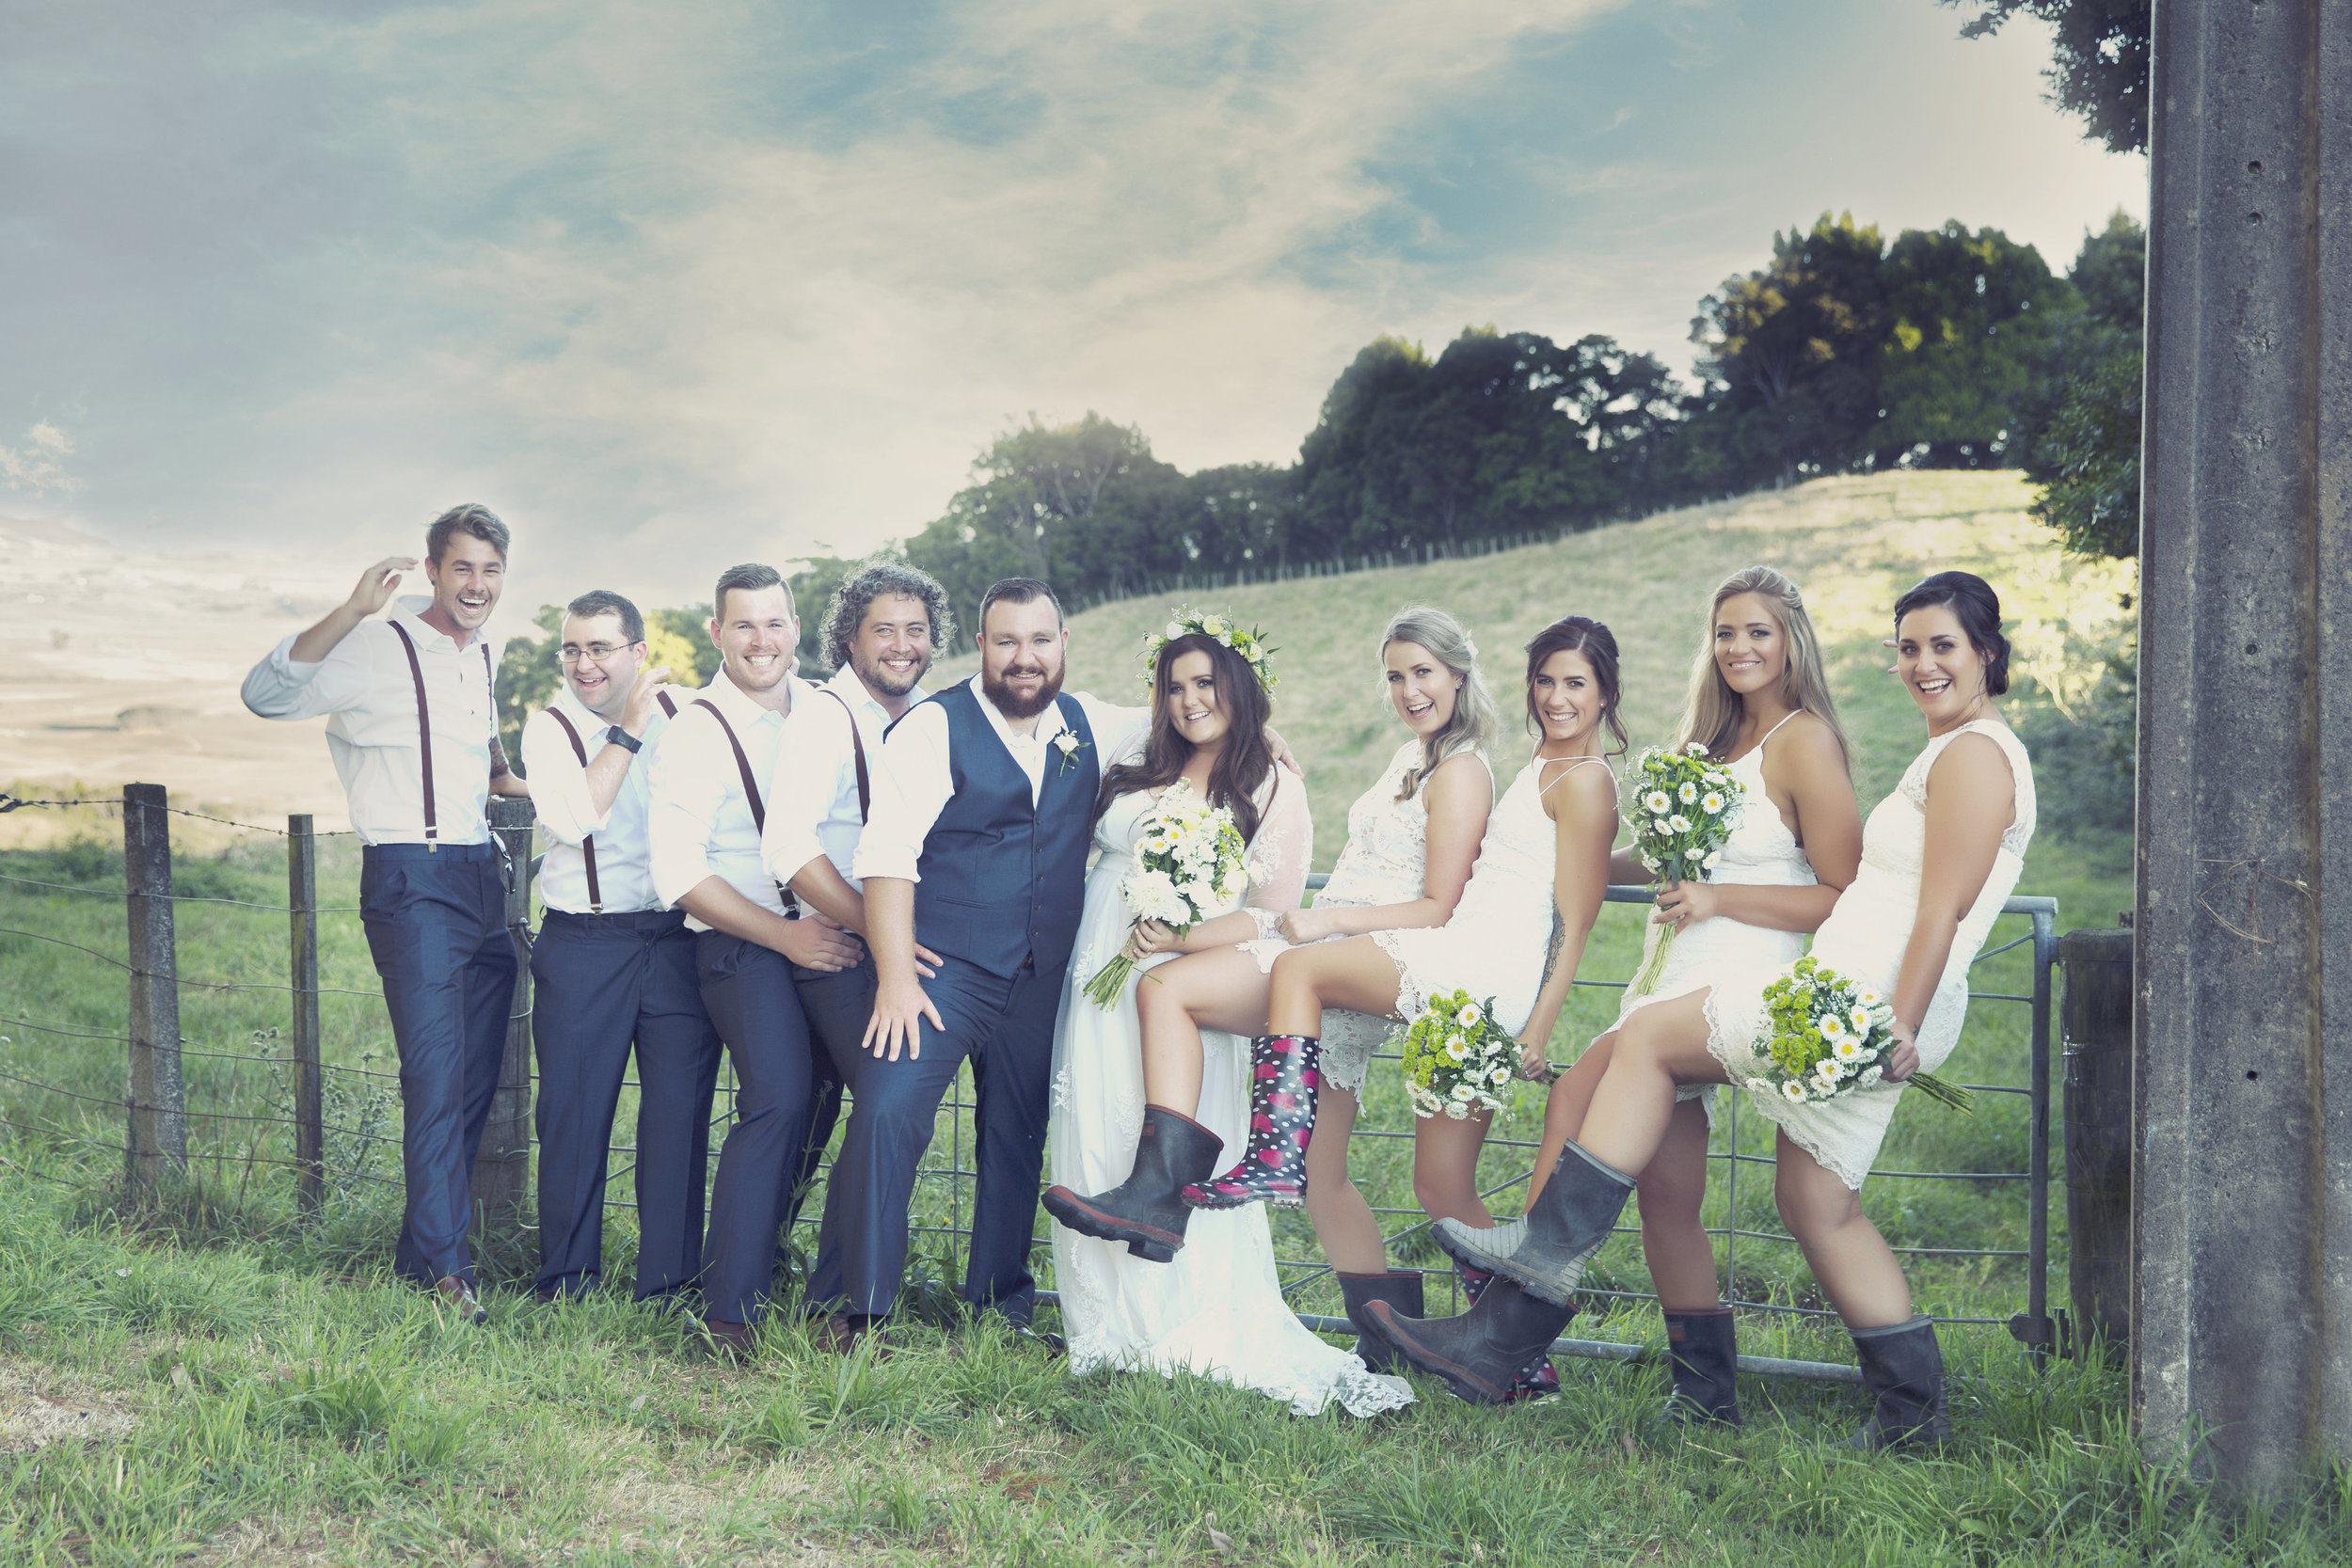 tarsha-mehrtens-wedding-3.jpg